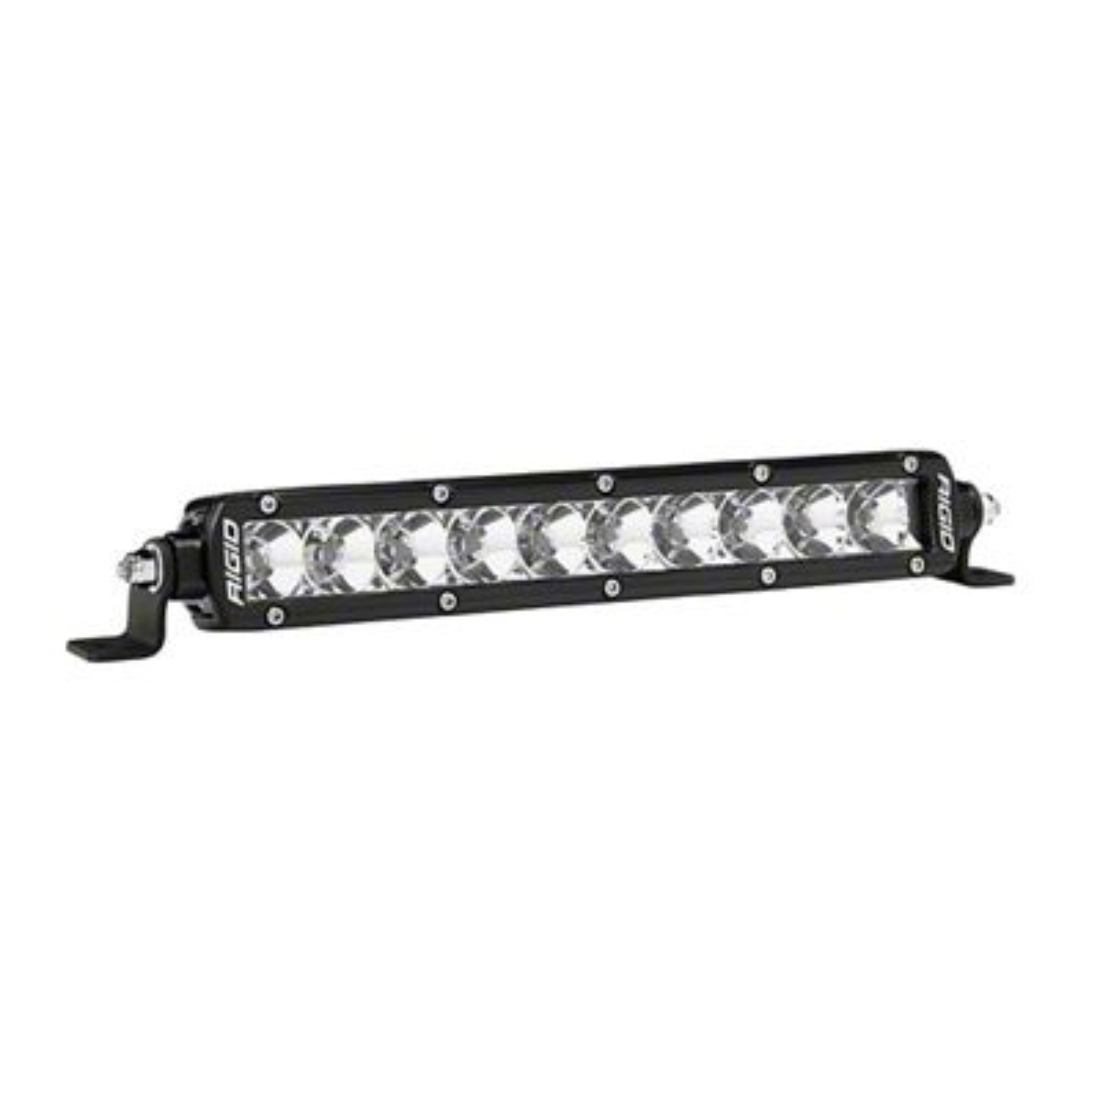 Rigid Industries 10 in. SR-Series Amber LED Light Bar - Flood Beam